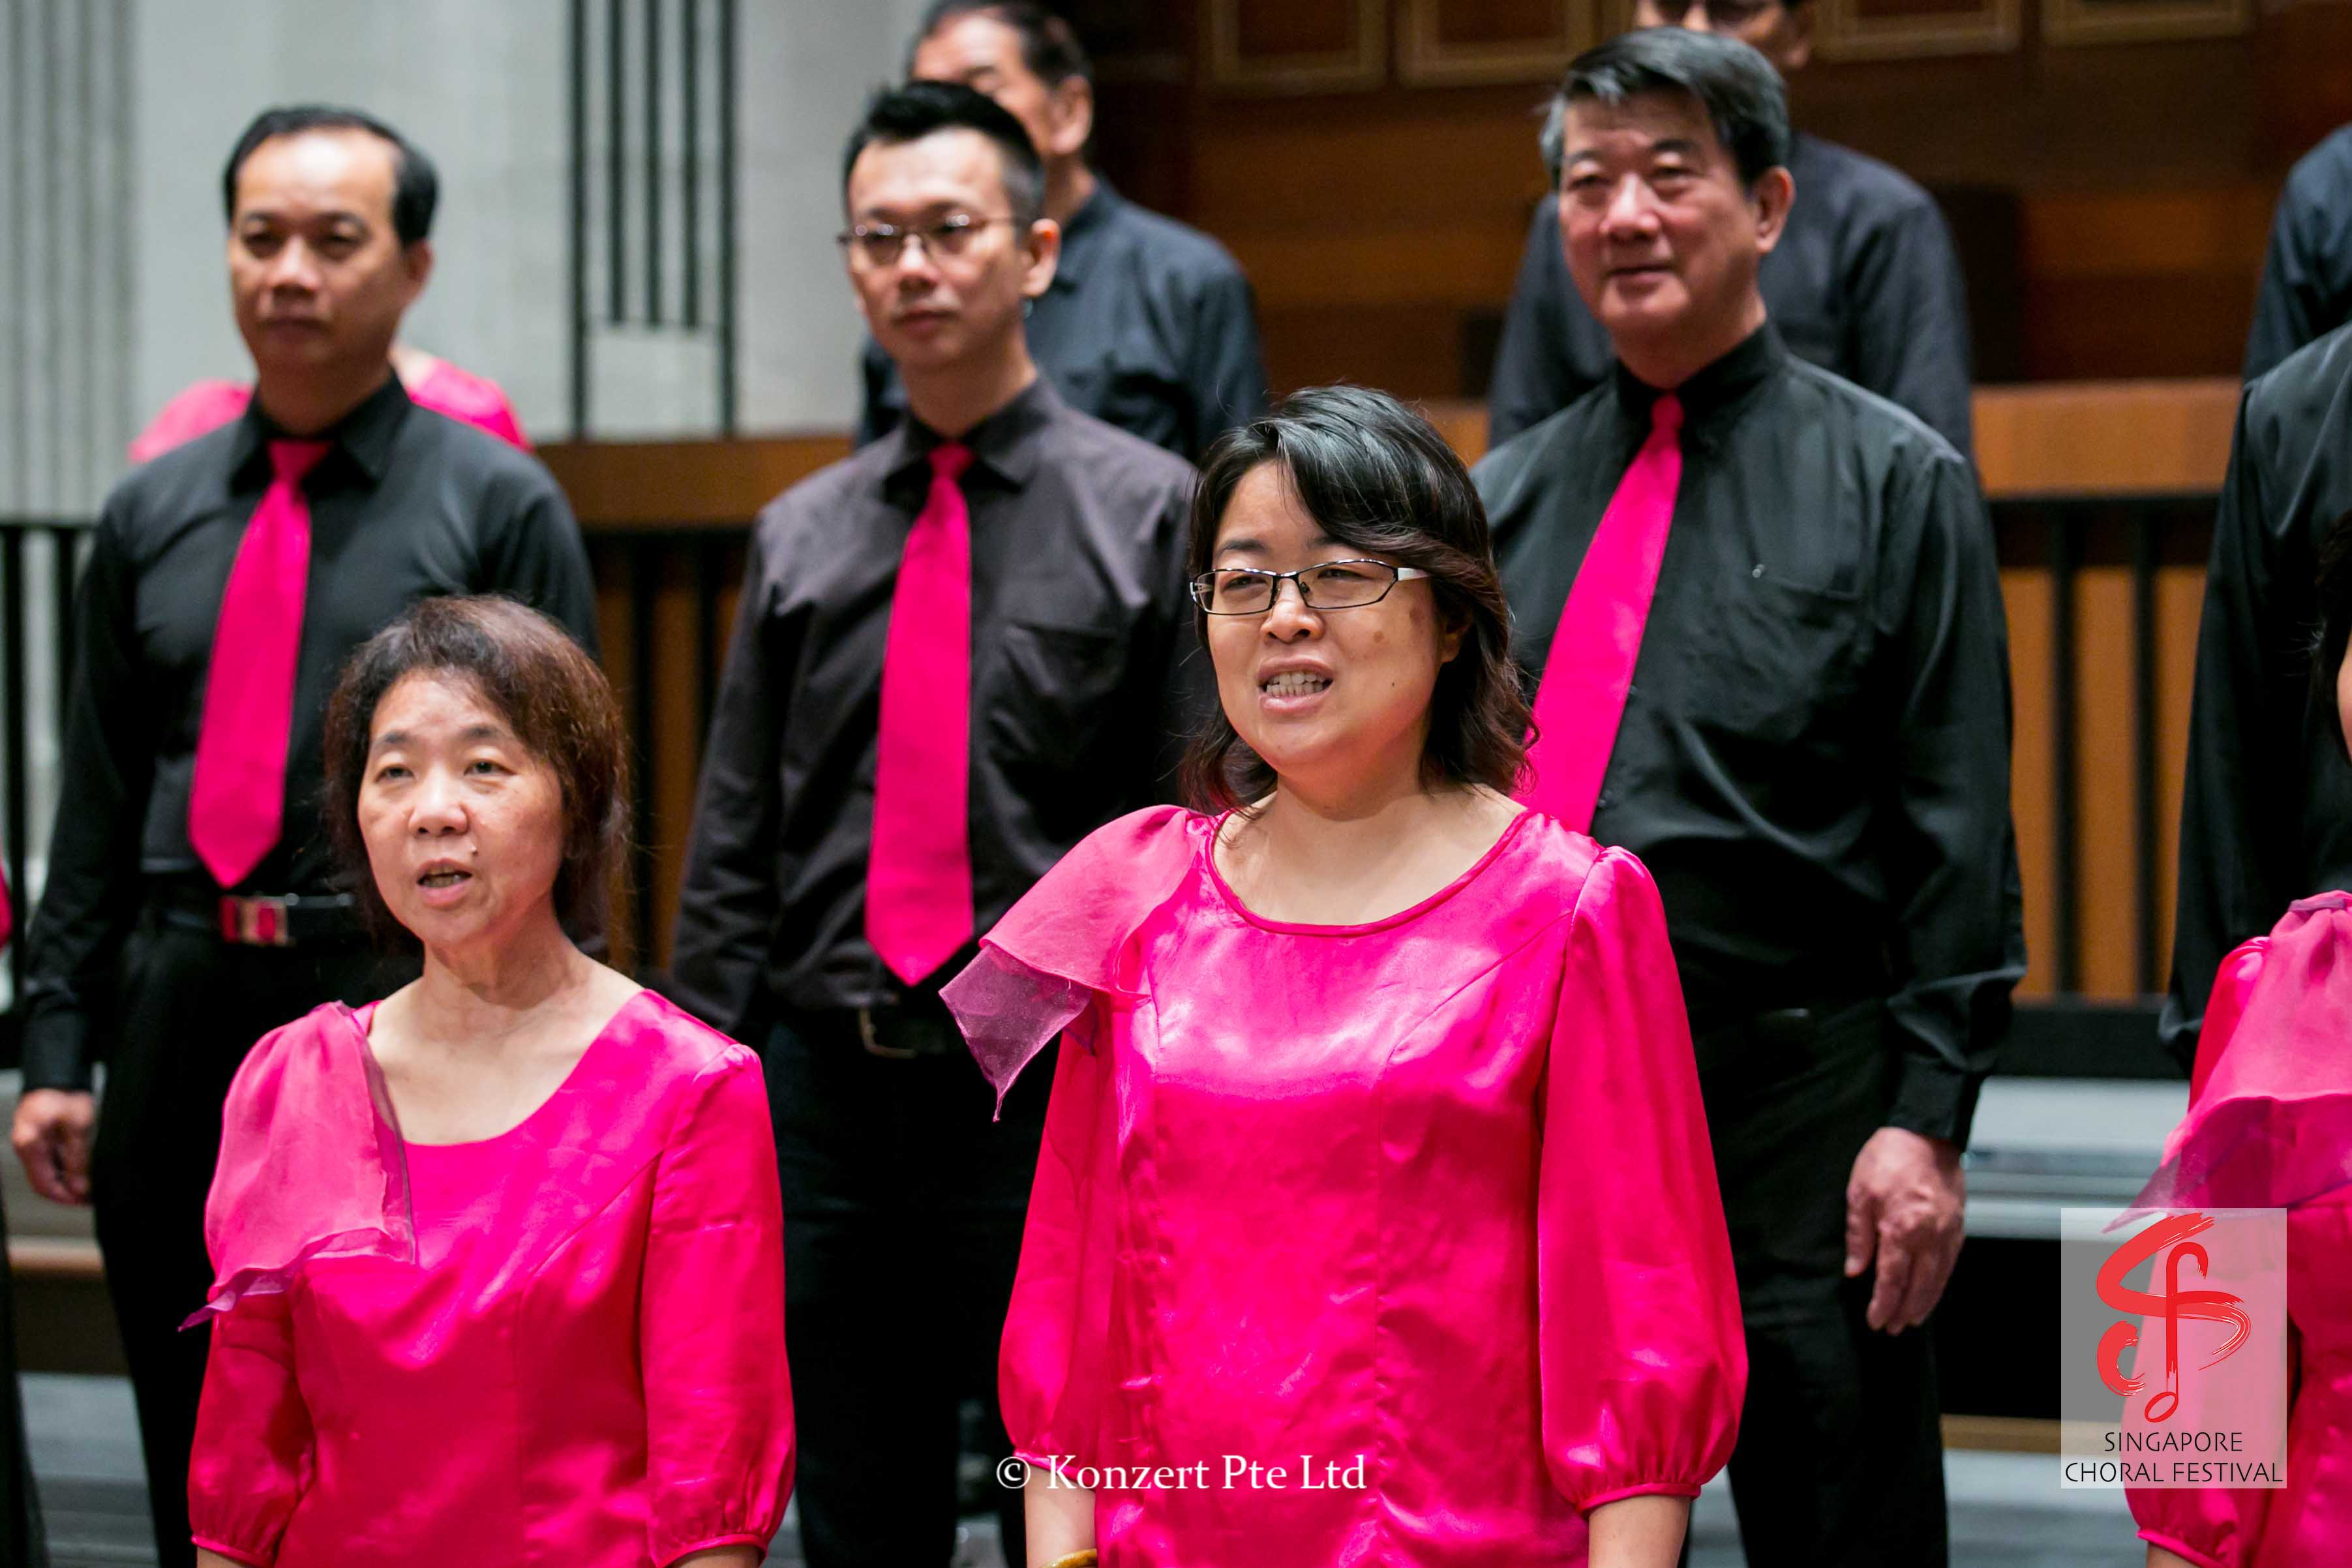 Singapore Choral Festival 7-8-15 (24).jpg